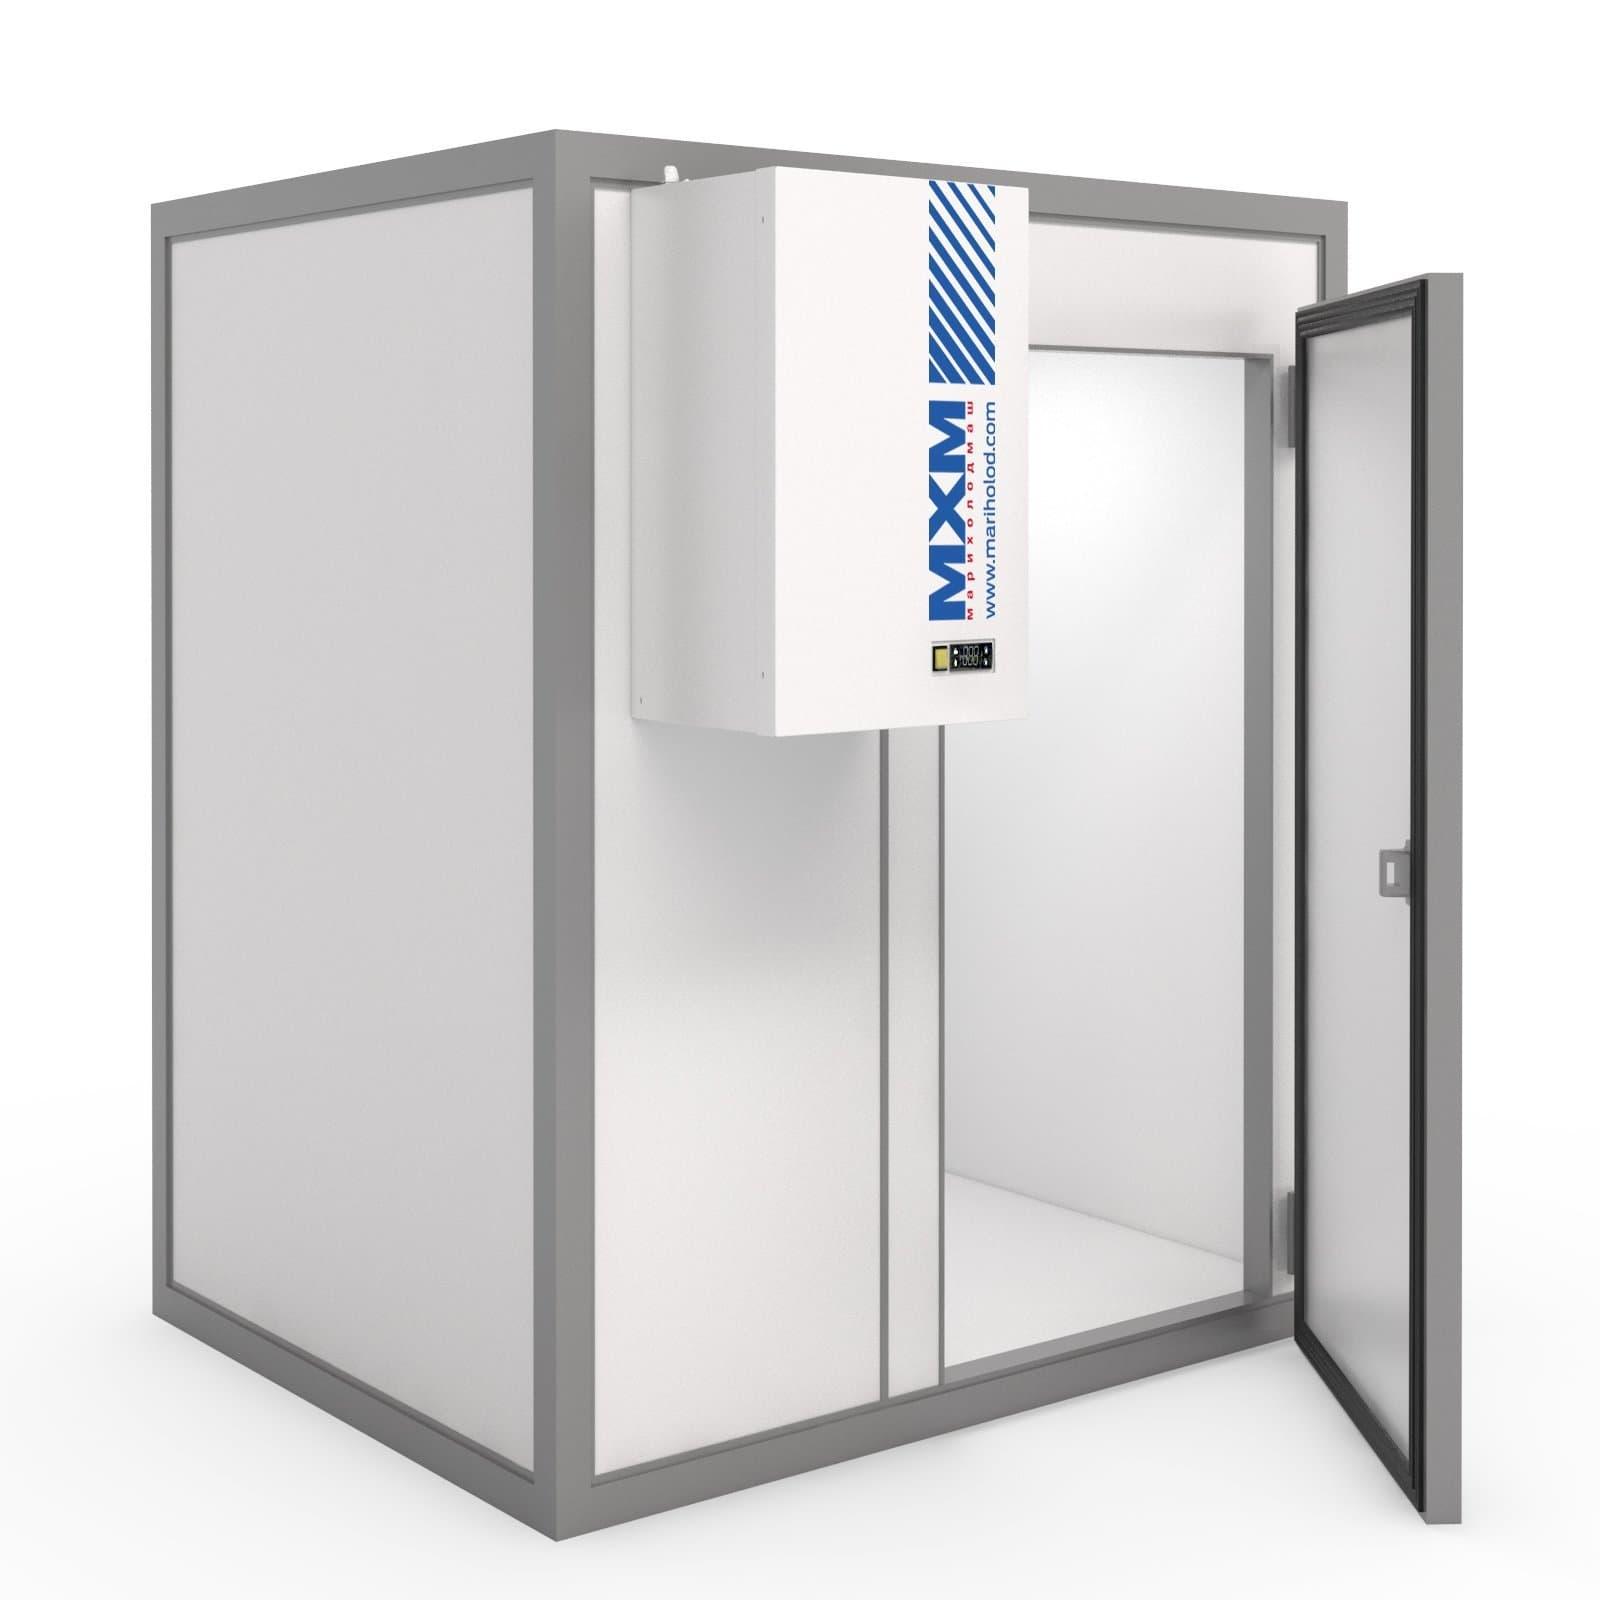 Камера холодильная МХМ КХН-45,16 2260×8560×2720